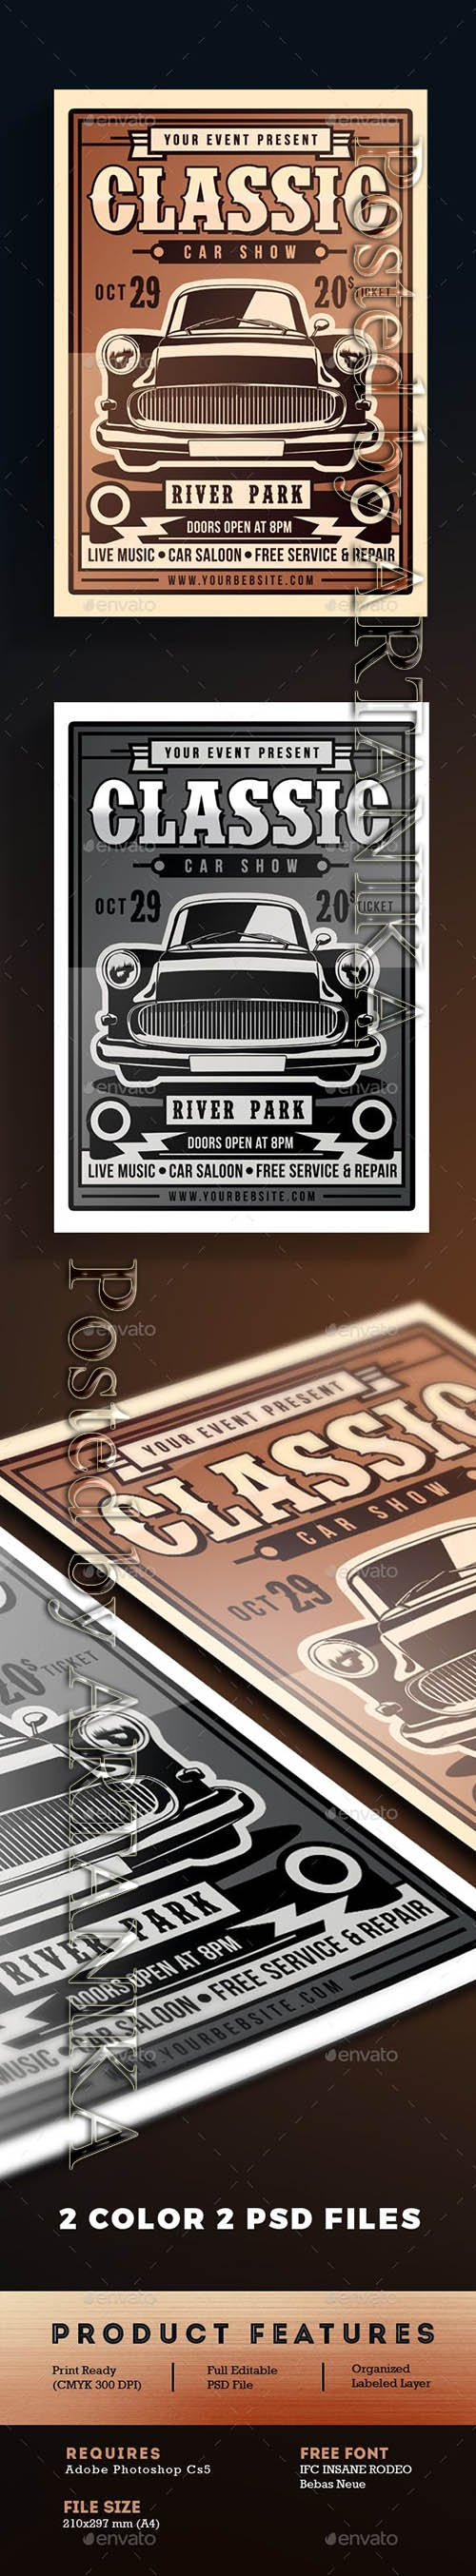 Graphicriver - Classic Car Show Flyer 18292715